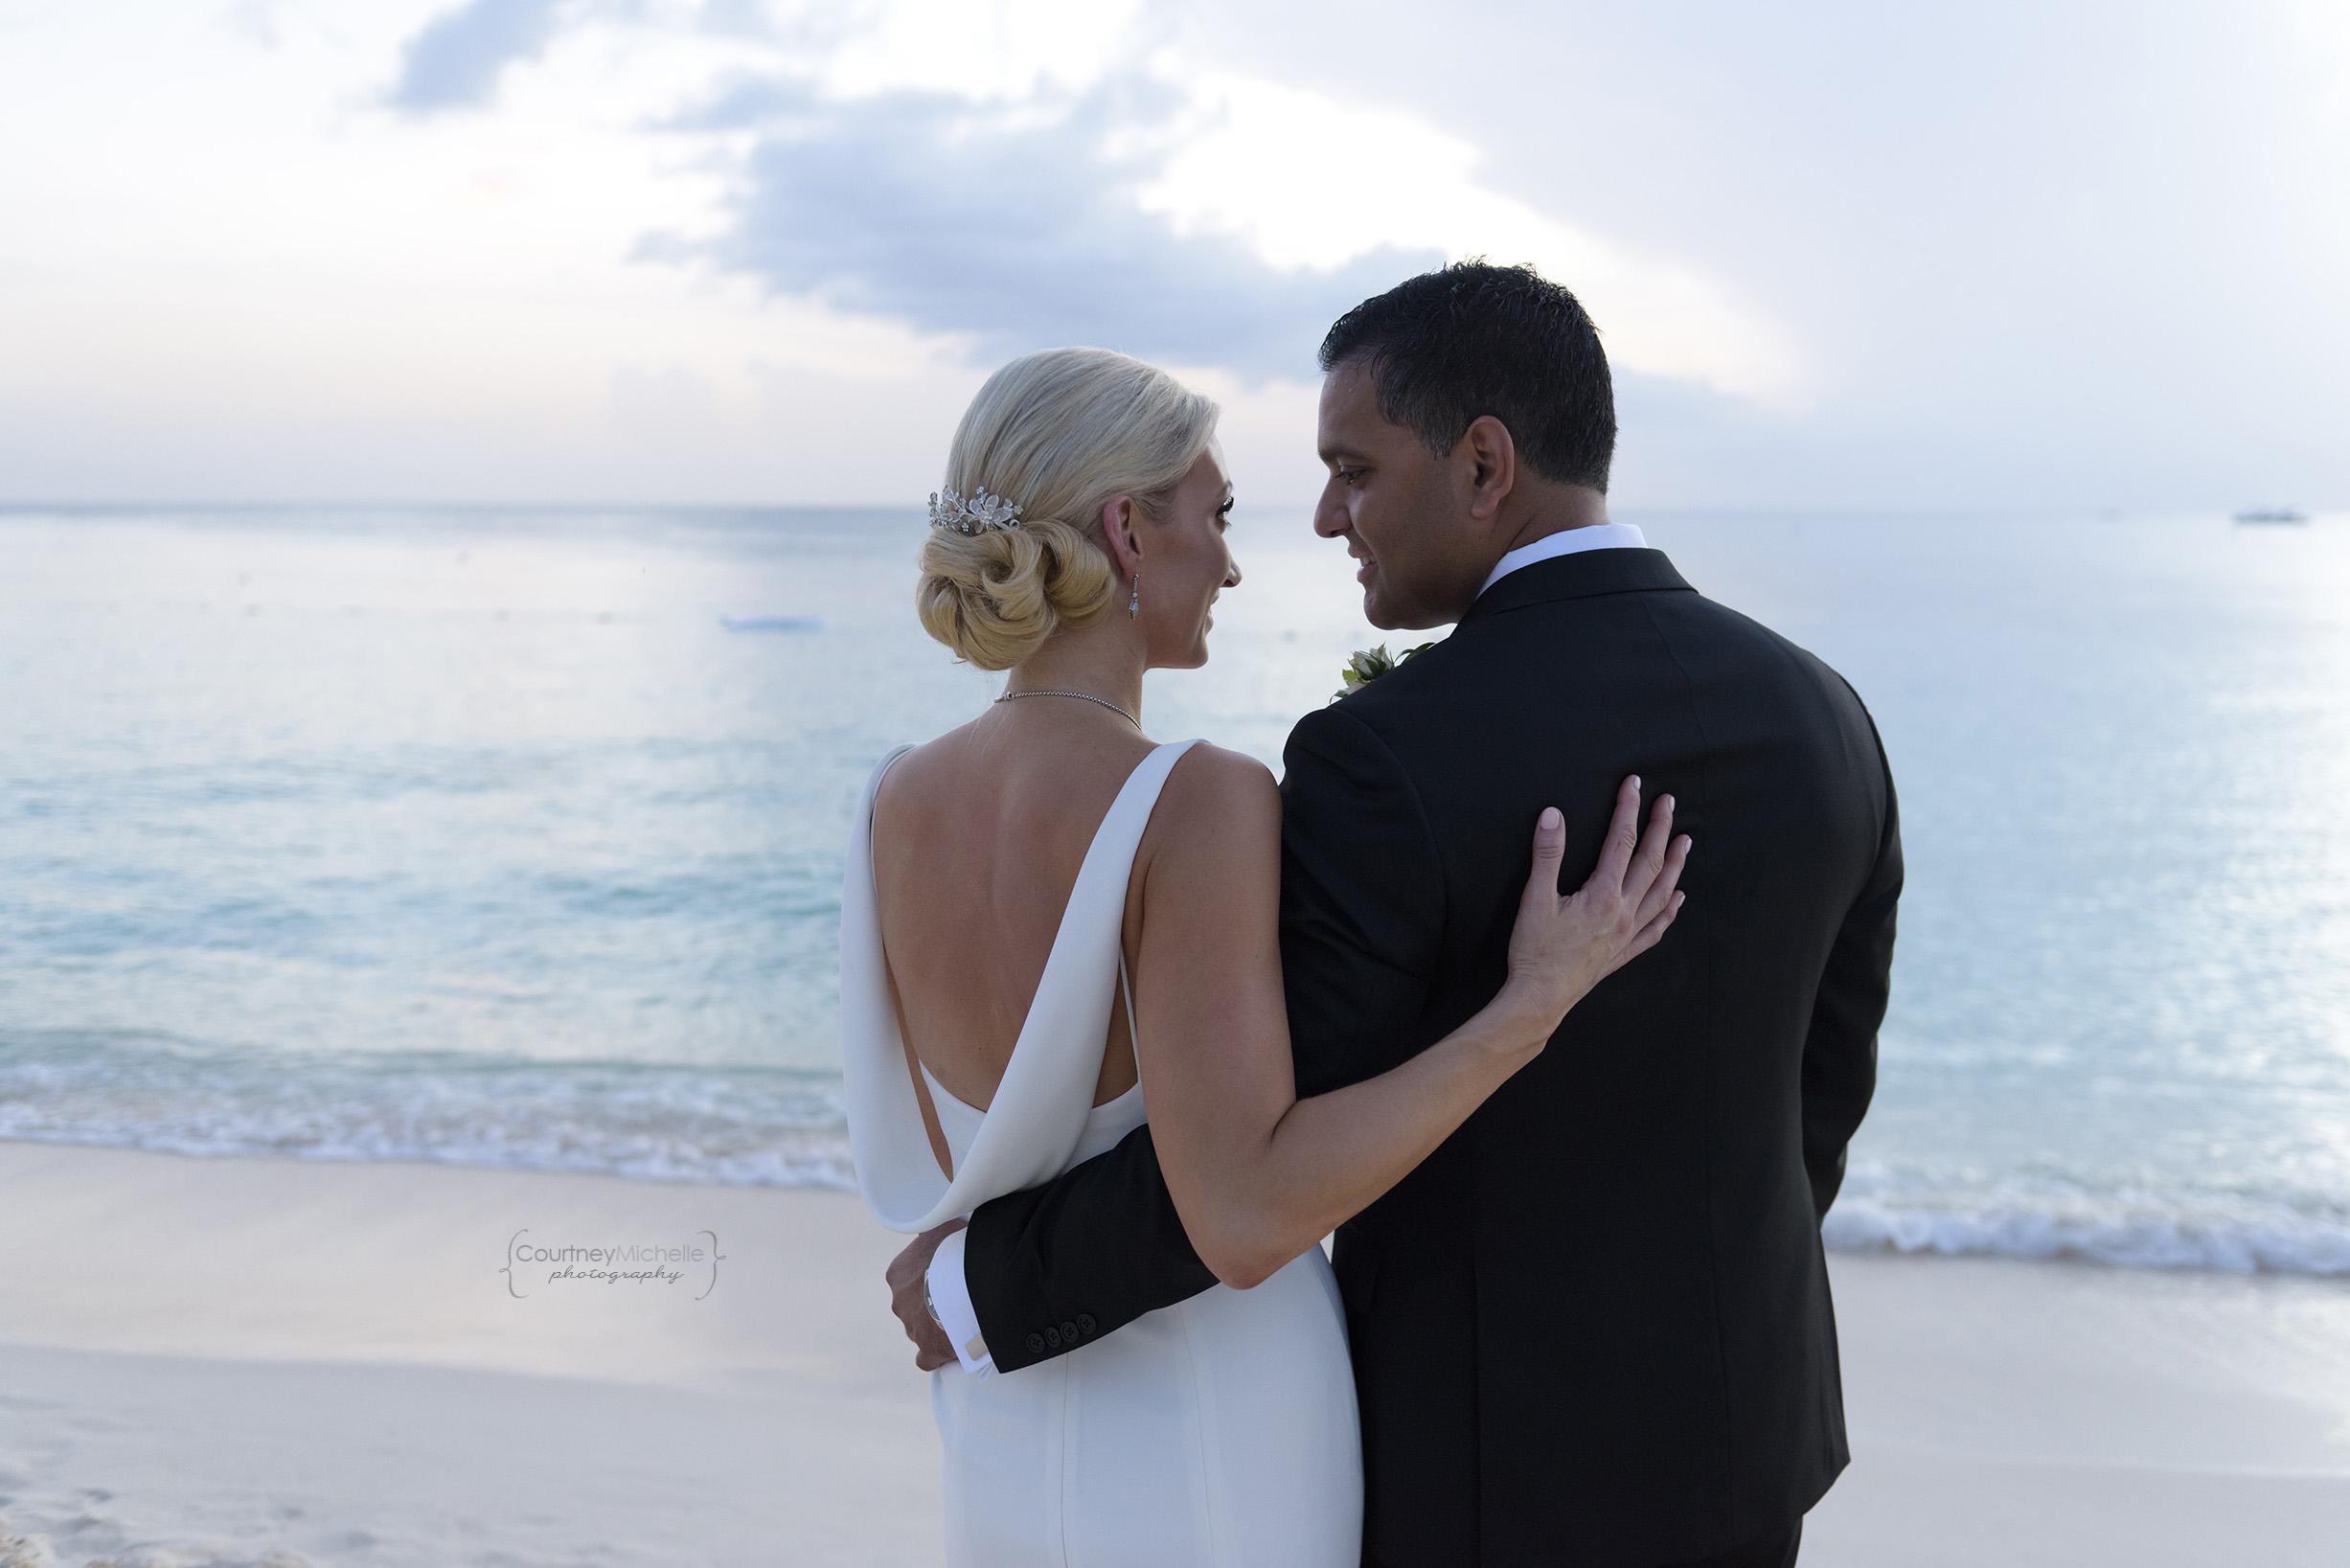 bride-and-groom-portrait-grand-cayman-beach-wedding-photography-by-courtney-laper©CopyrightCMP-LeaAnneRaj-8023.jpg